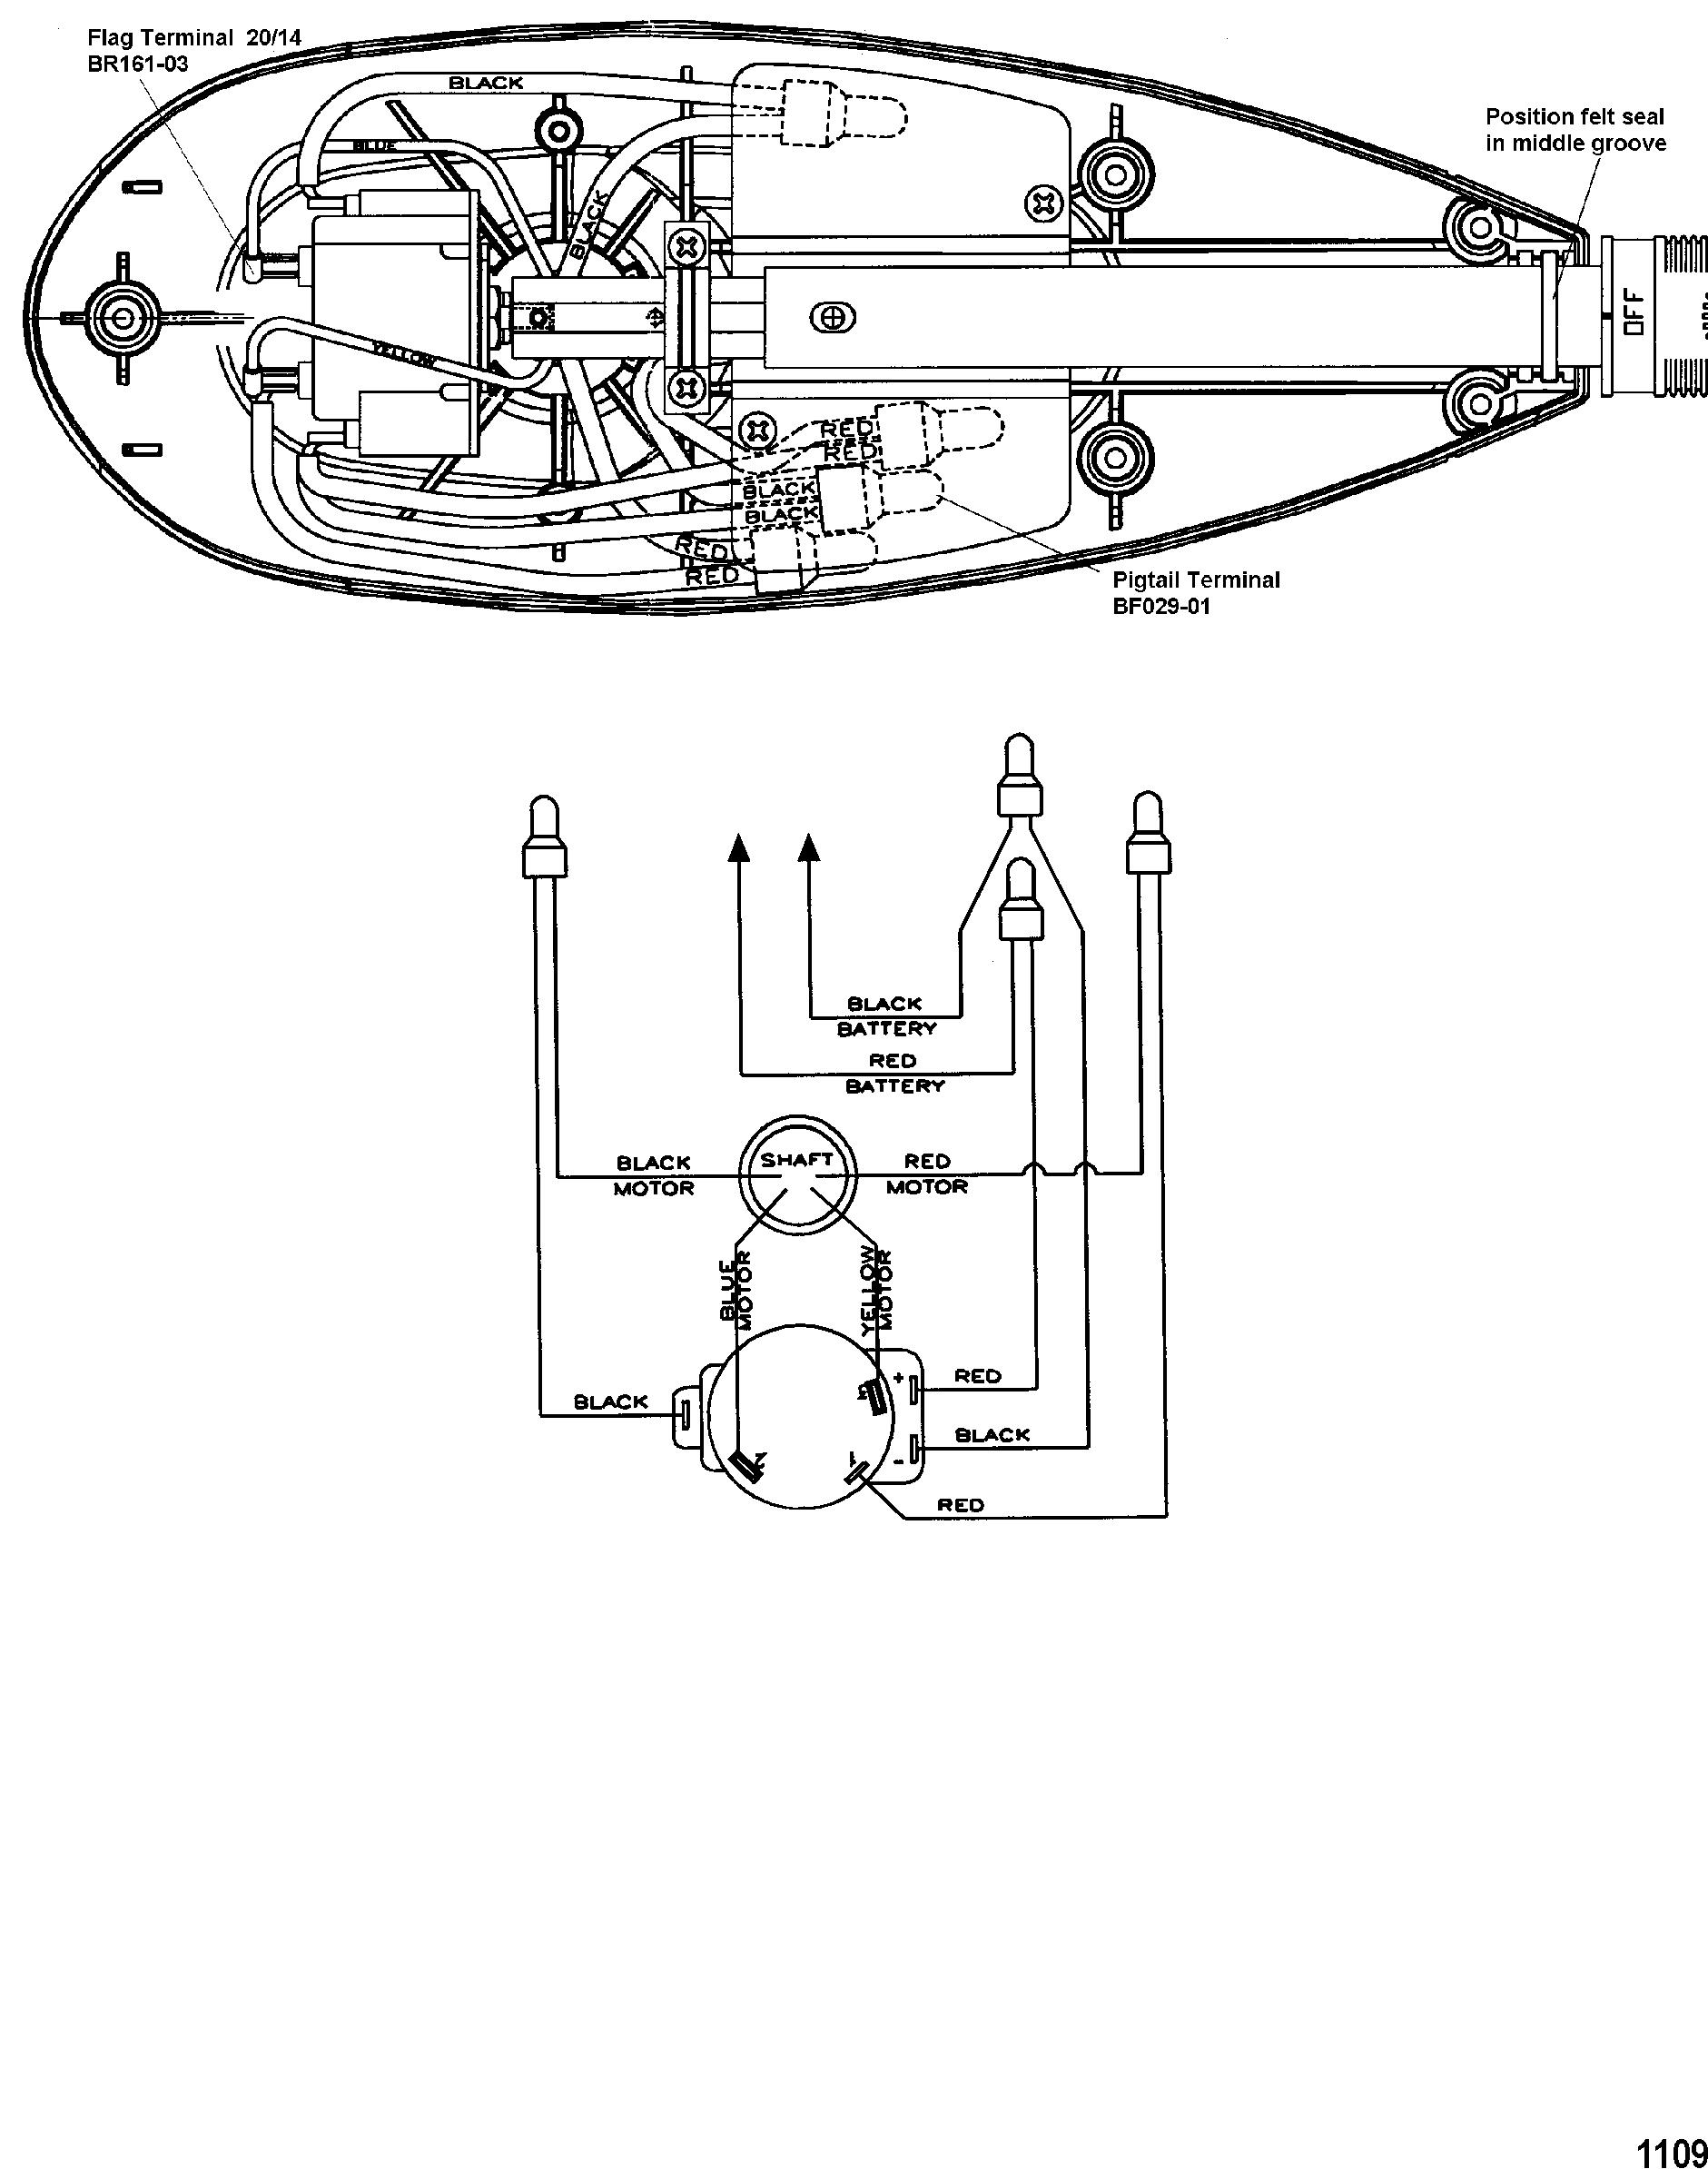 Motorguide 24 36 Volt Diagrams User Guide Manual That Easy To Read Starter Wiring Diagram Trolling Motor Energy Series All Up Rh Mercury Lakor Com 3 Amp Transformer